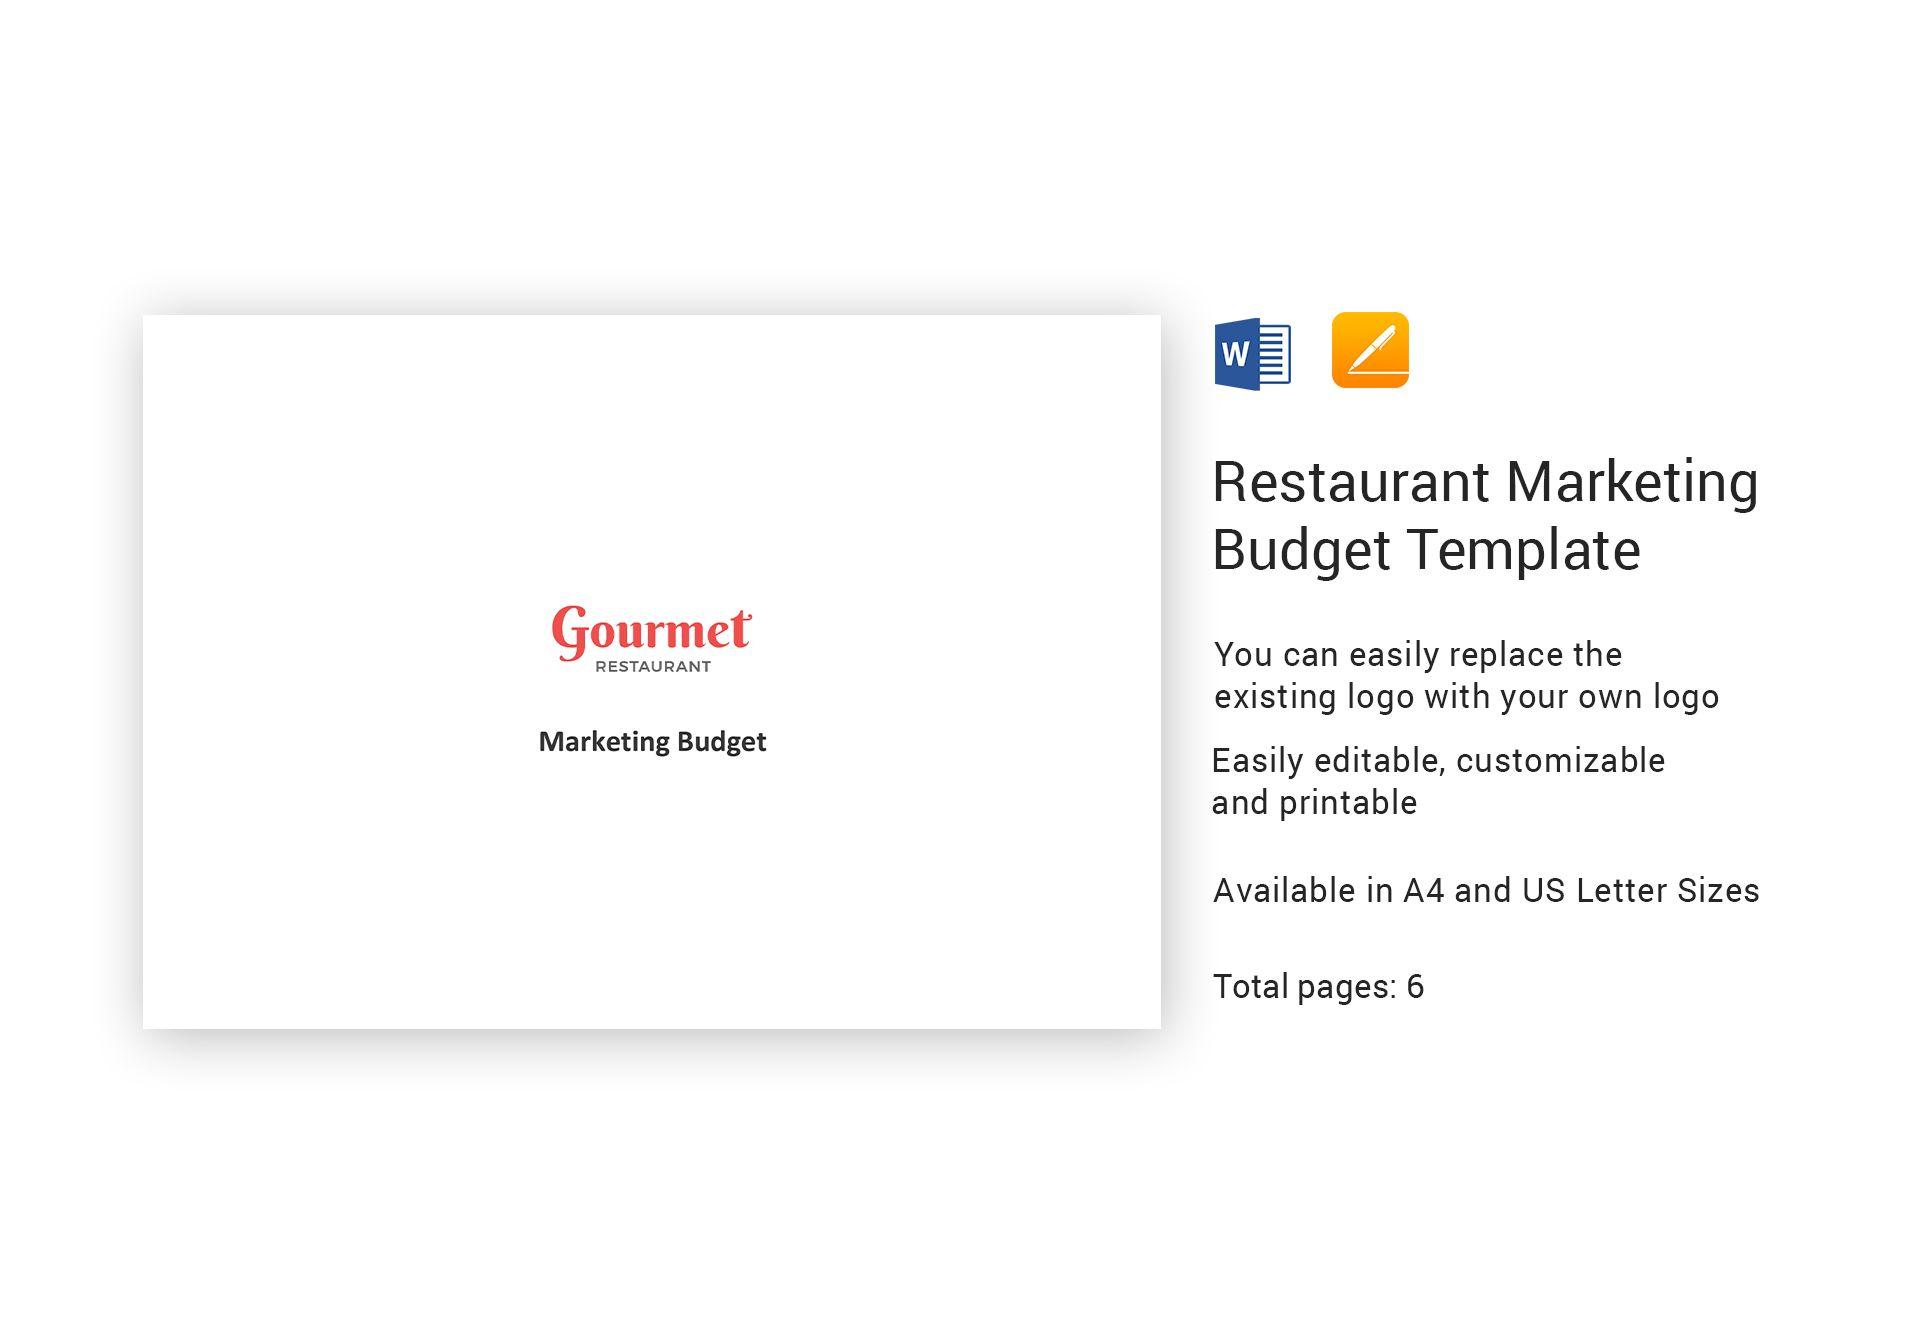 Restaurant Marketing Budget